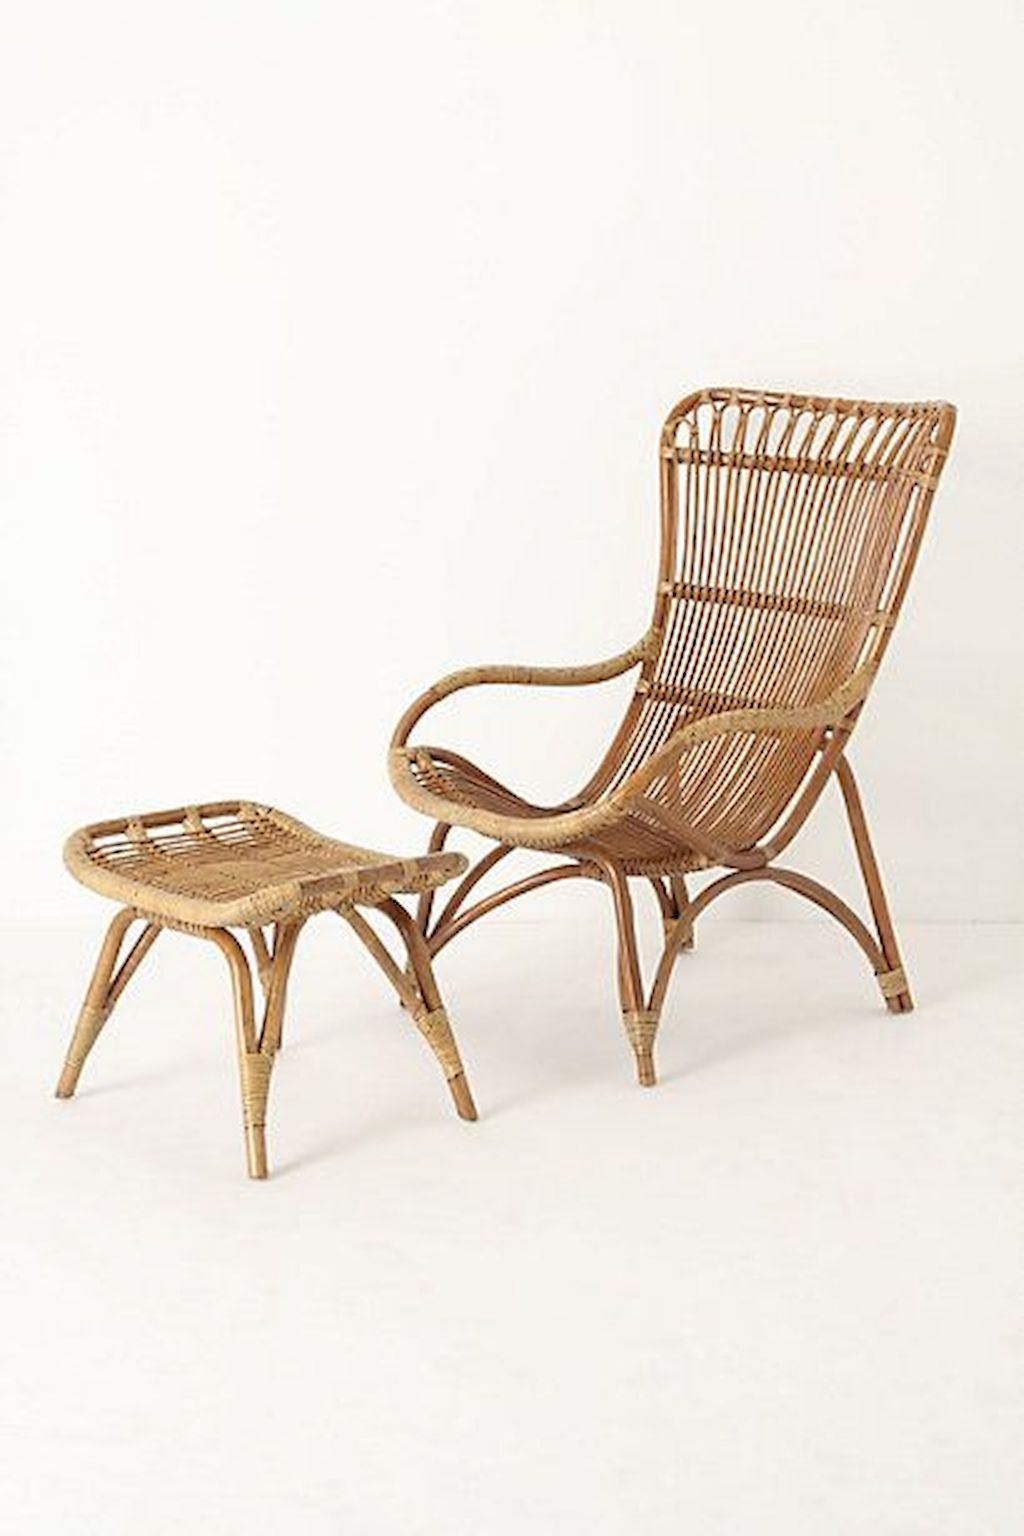 Rattan Furniture124